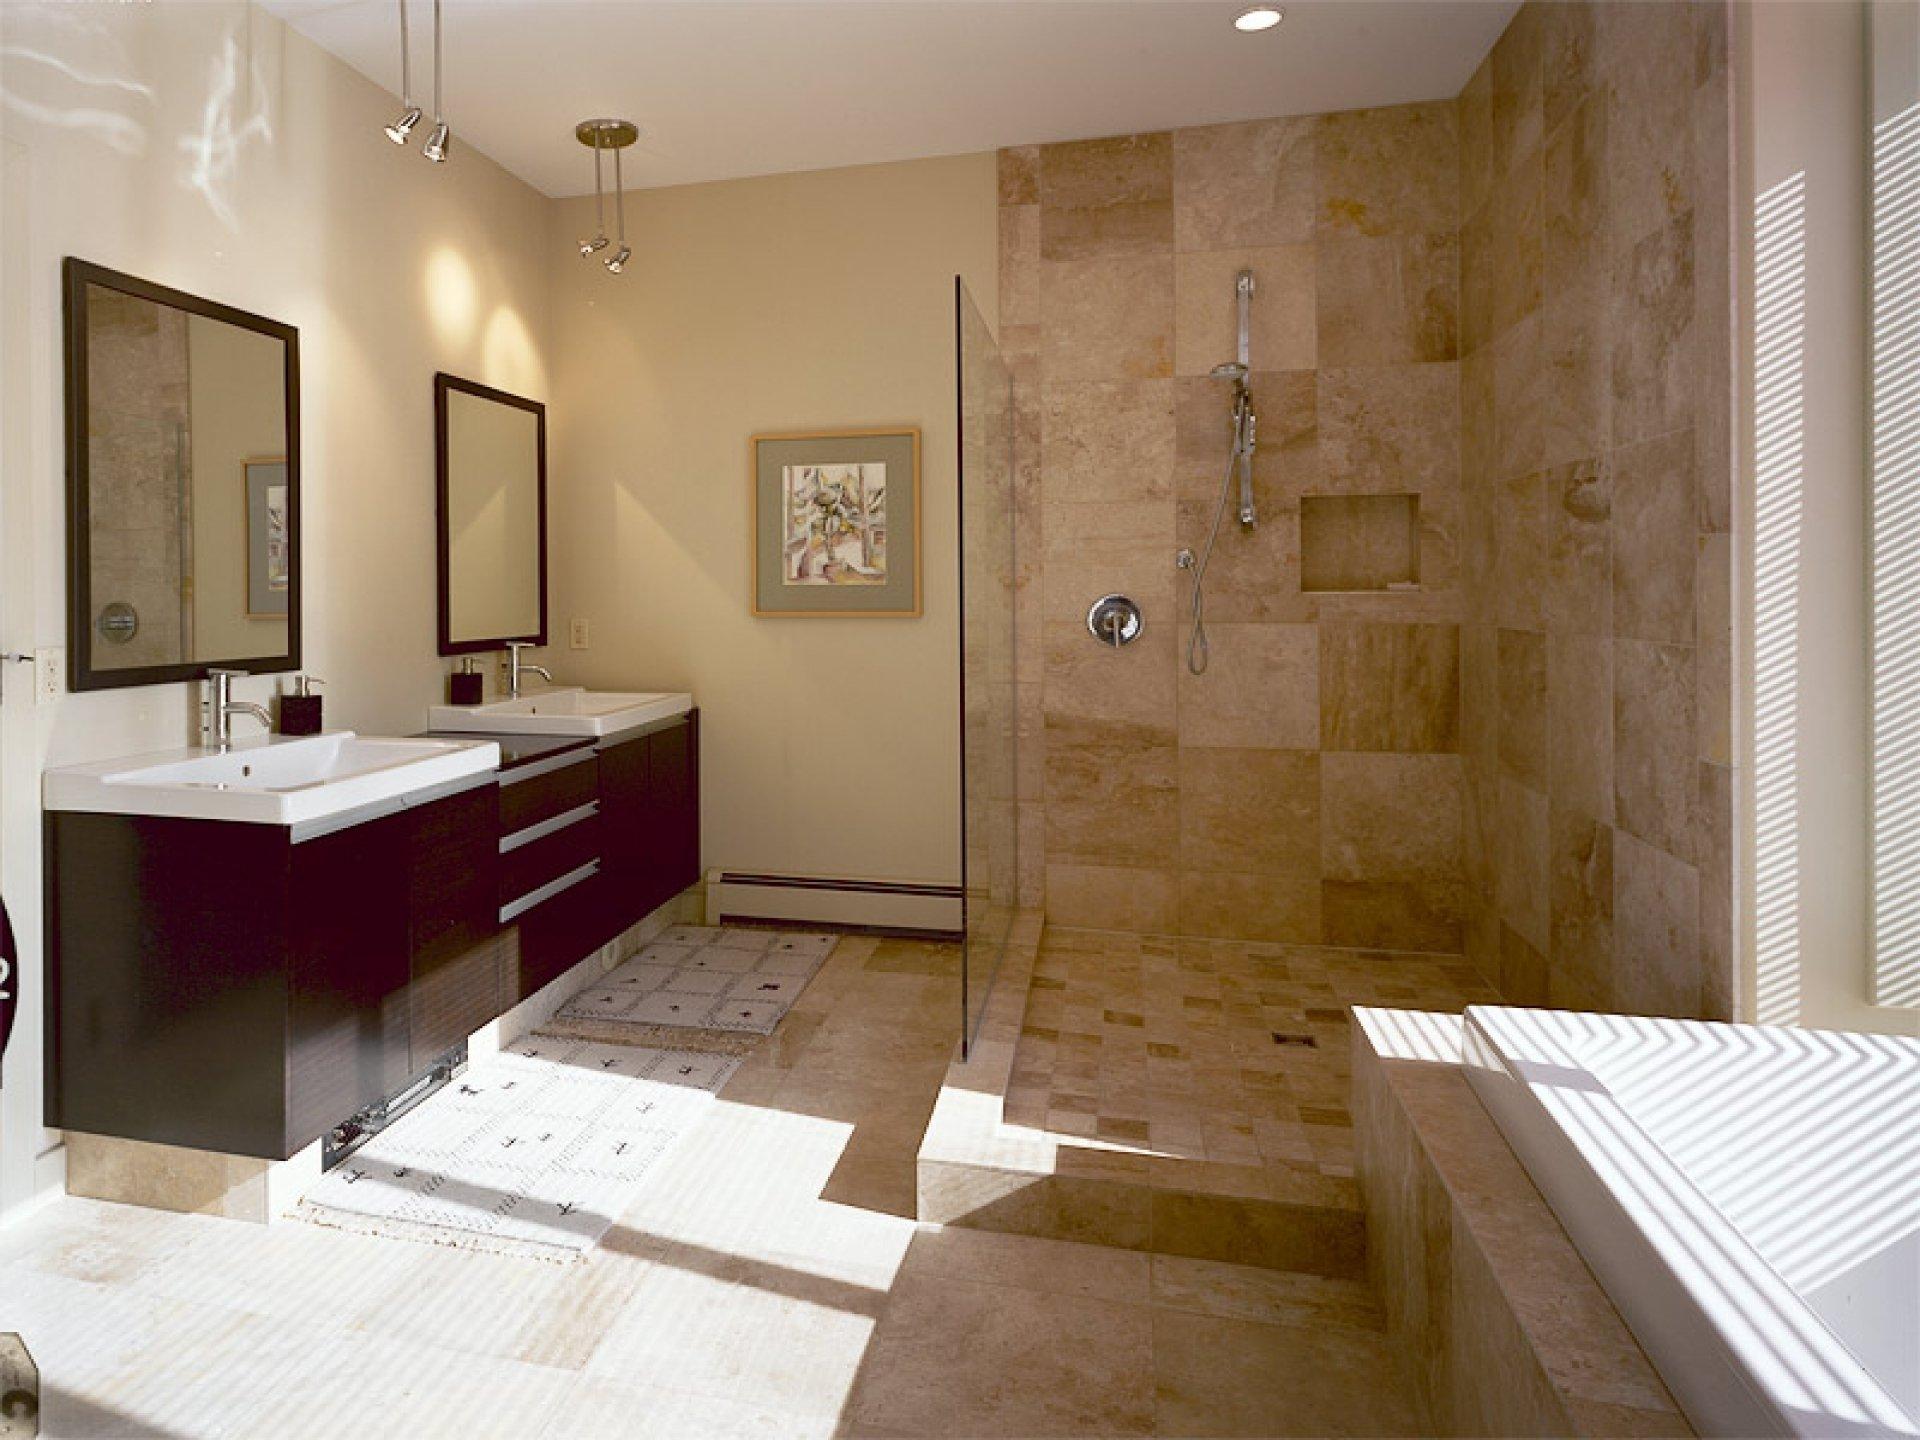 10 Amazing Bathroom Tile Ideas On A Budget 30 pictures of bathroom tile ideas on a budget 2020